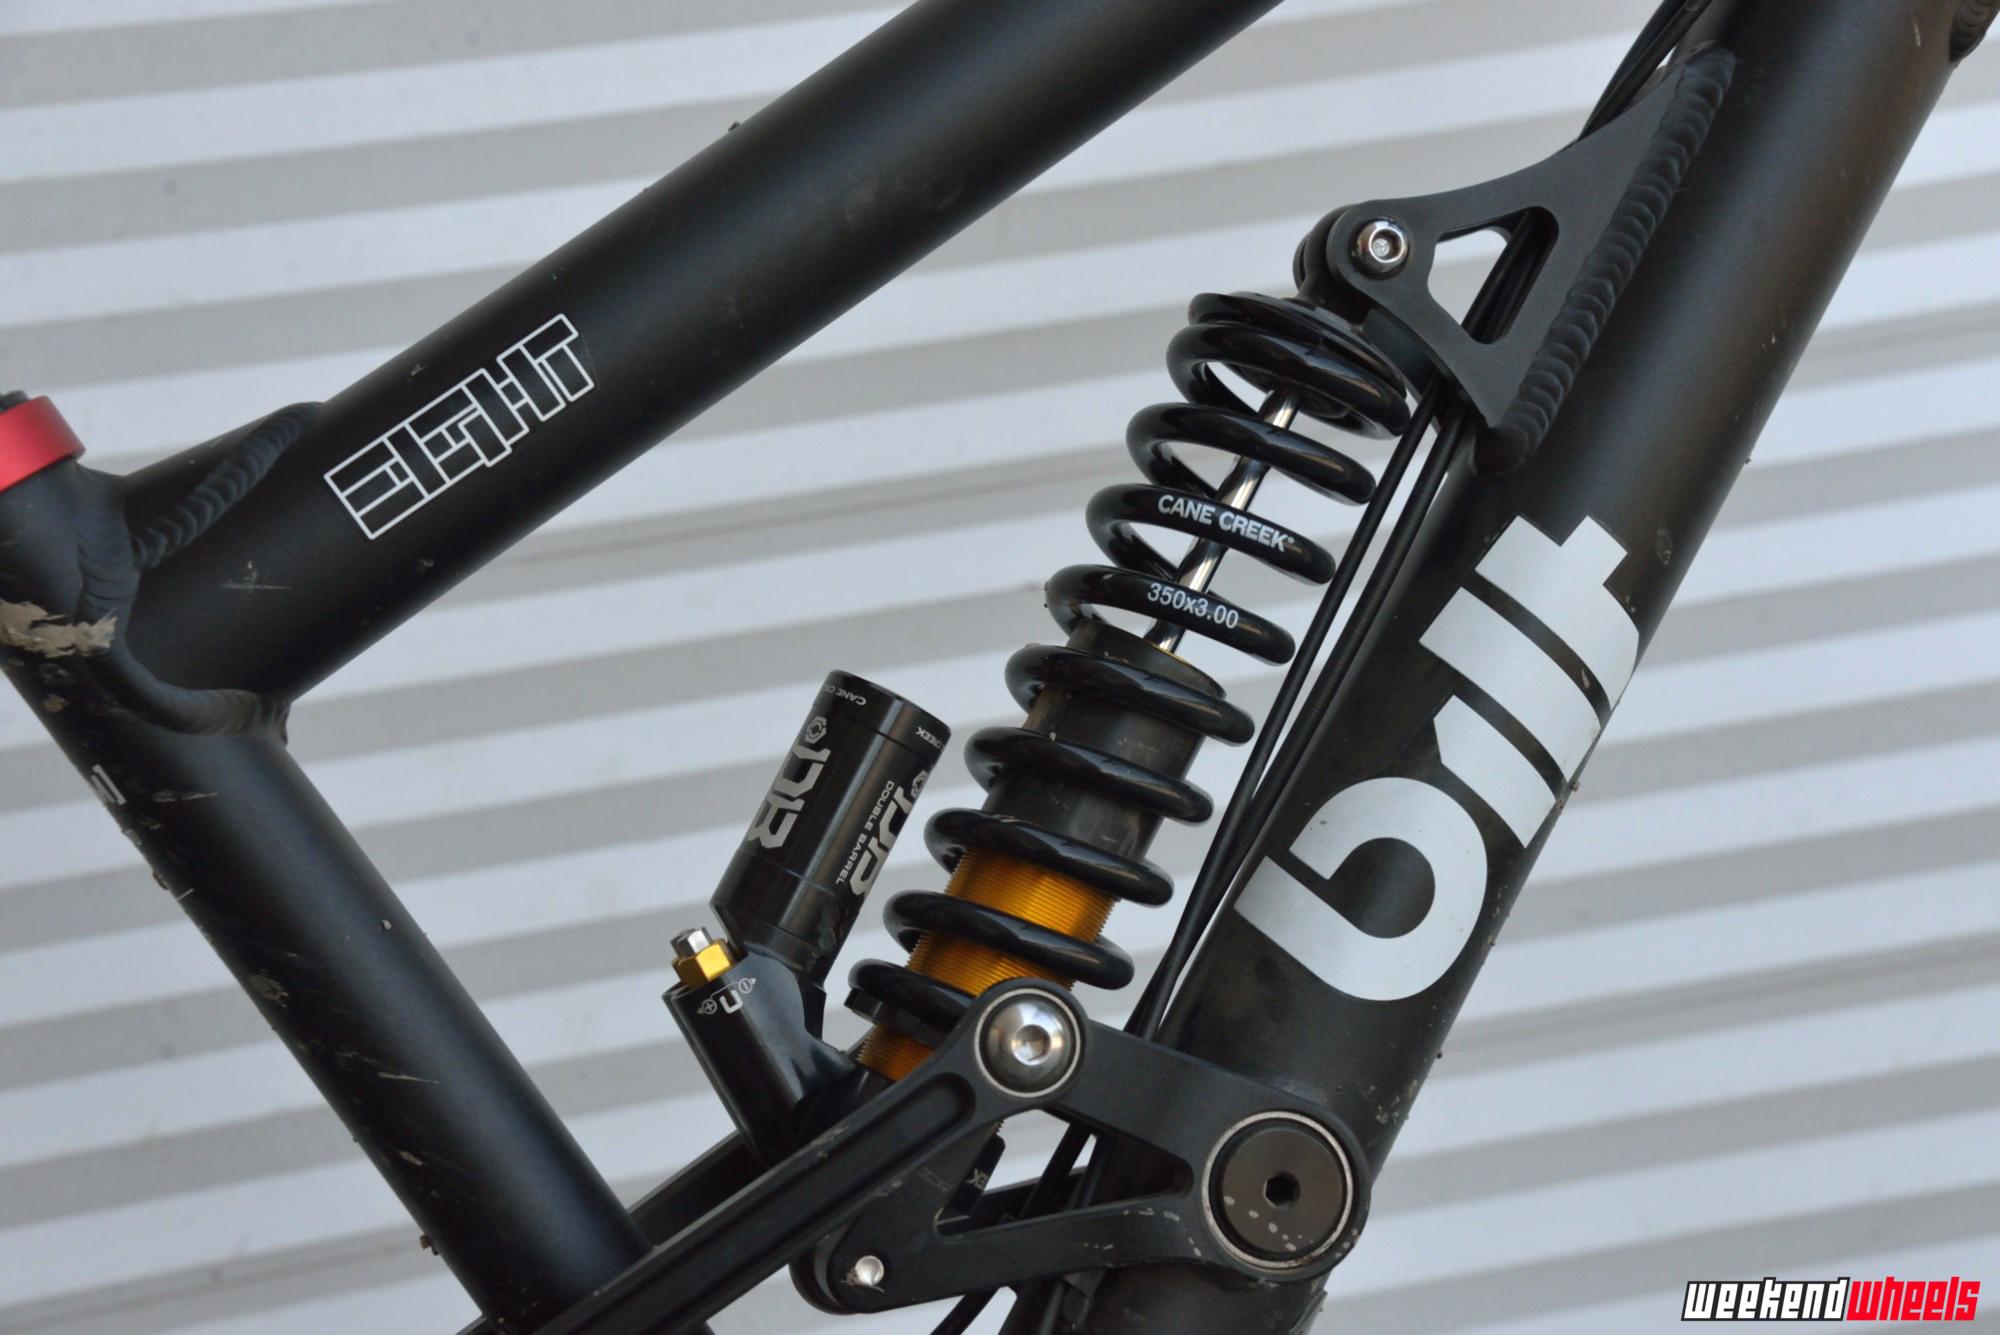 bilt_bike_eight_canecreek_doublebarrel